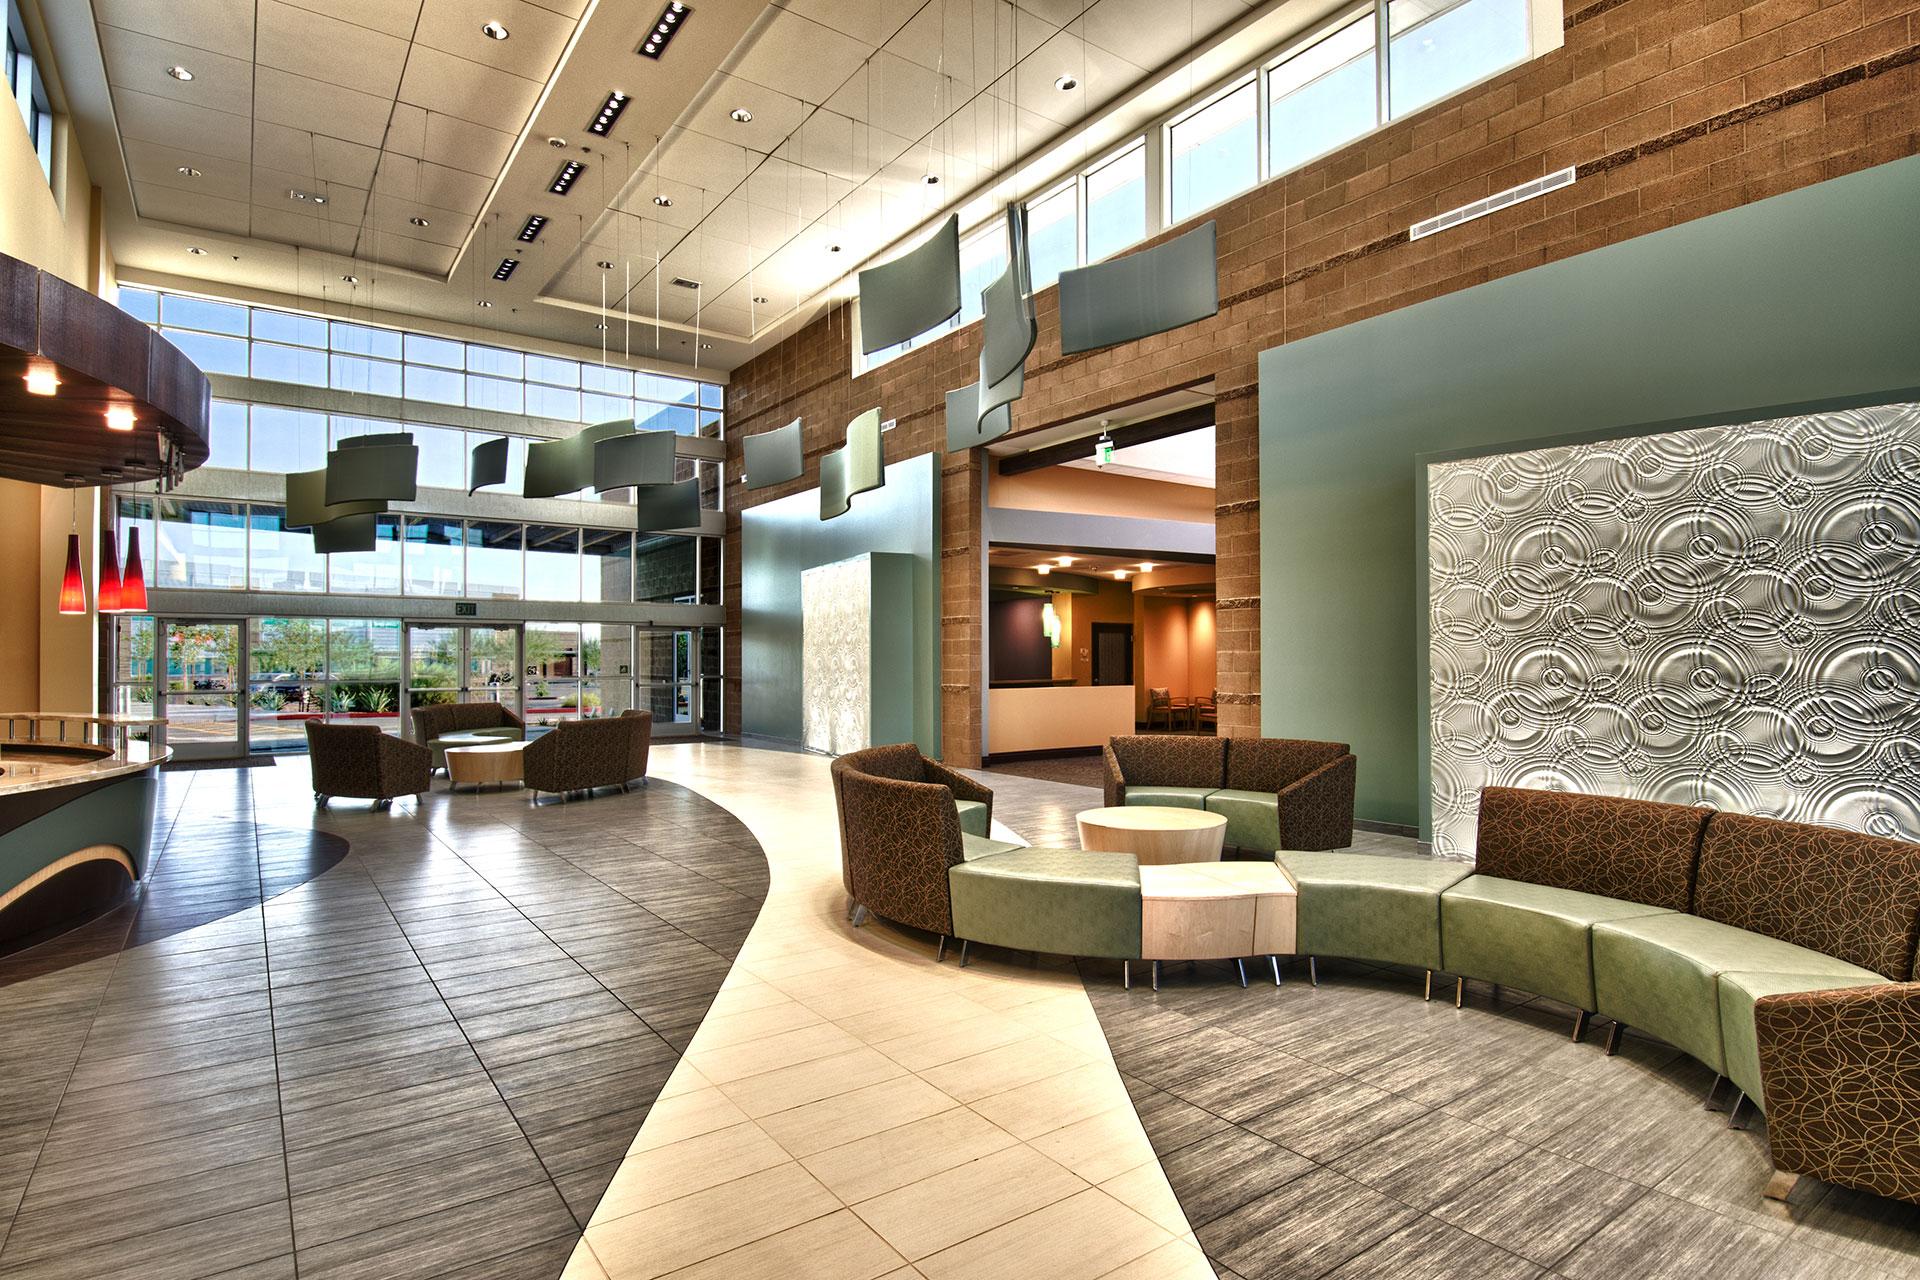 Adelante healthcare mesa cawley architects for Window design center